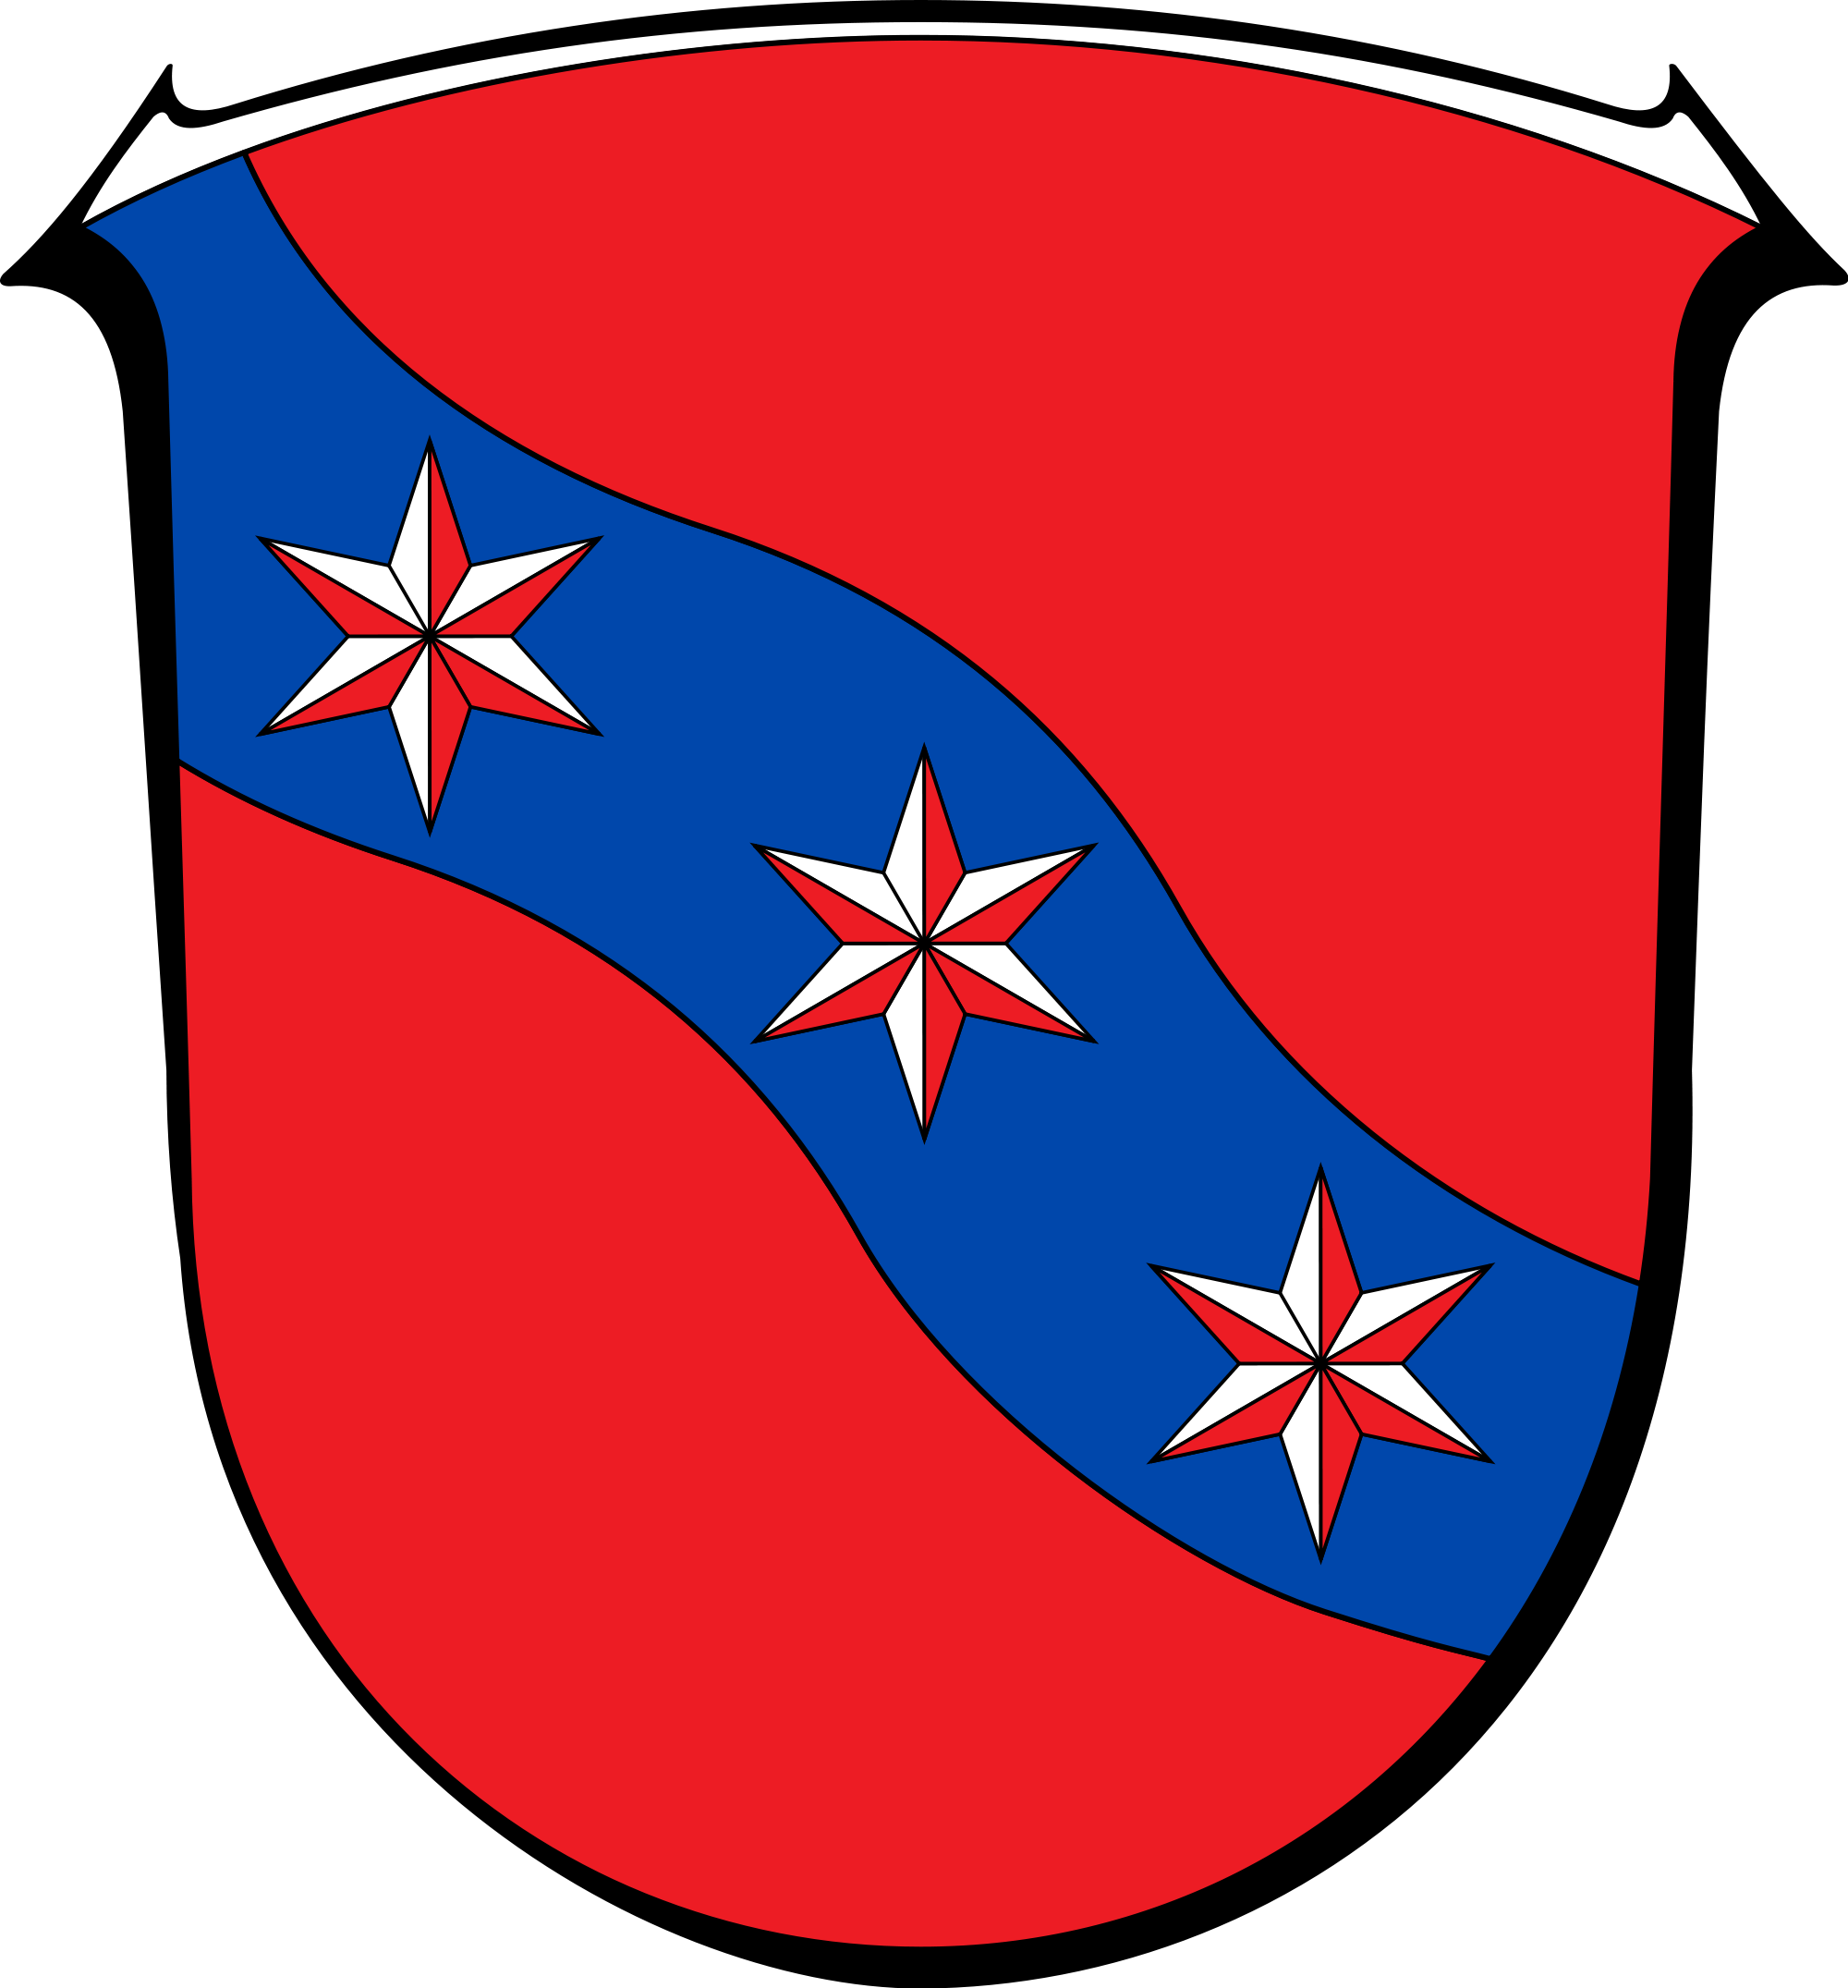 File:Wappen Erbach (Odenwald).svg.